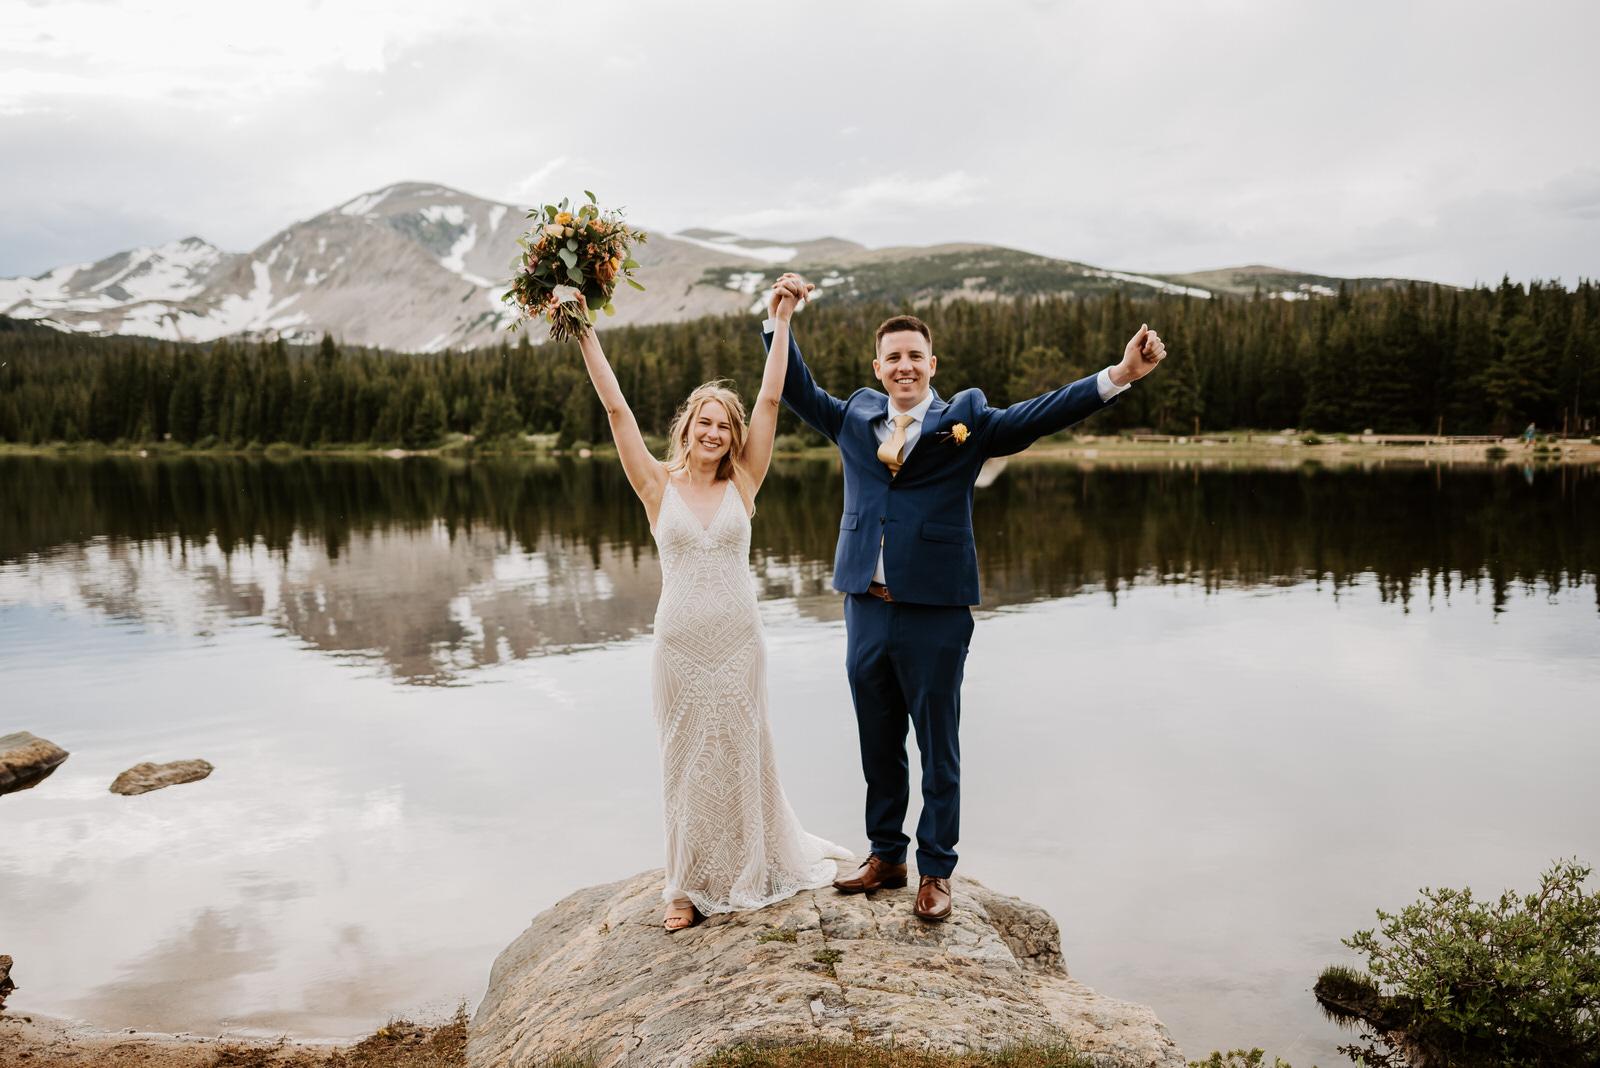 Brainard Lake Intimate Wedding by Kylie Farmer